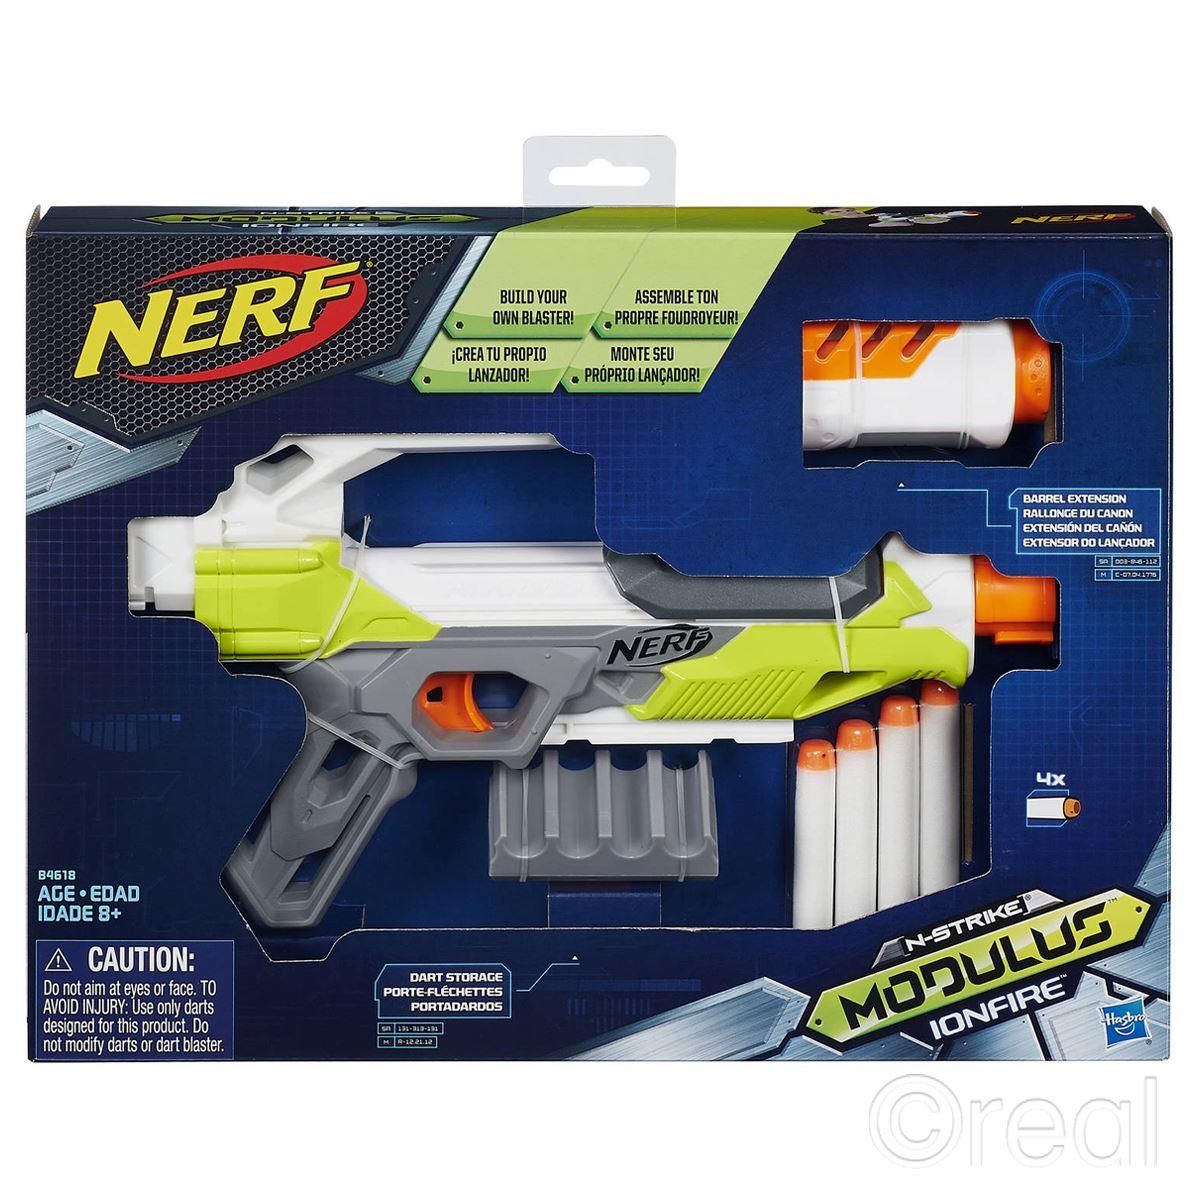 New-Nerf-Modulus-Ionfire-Blaster-amp-Darts-Or-